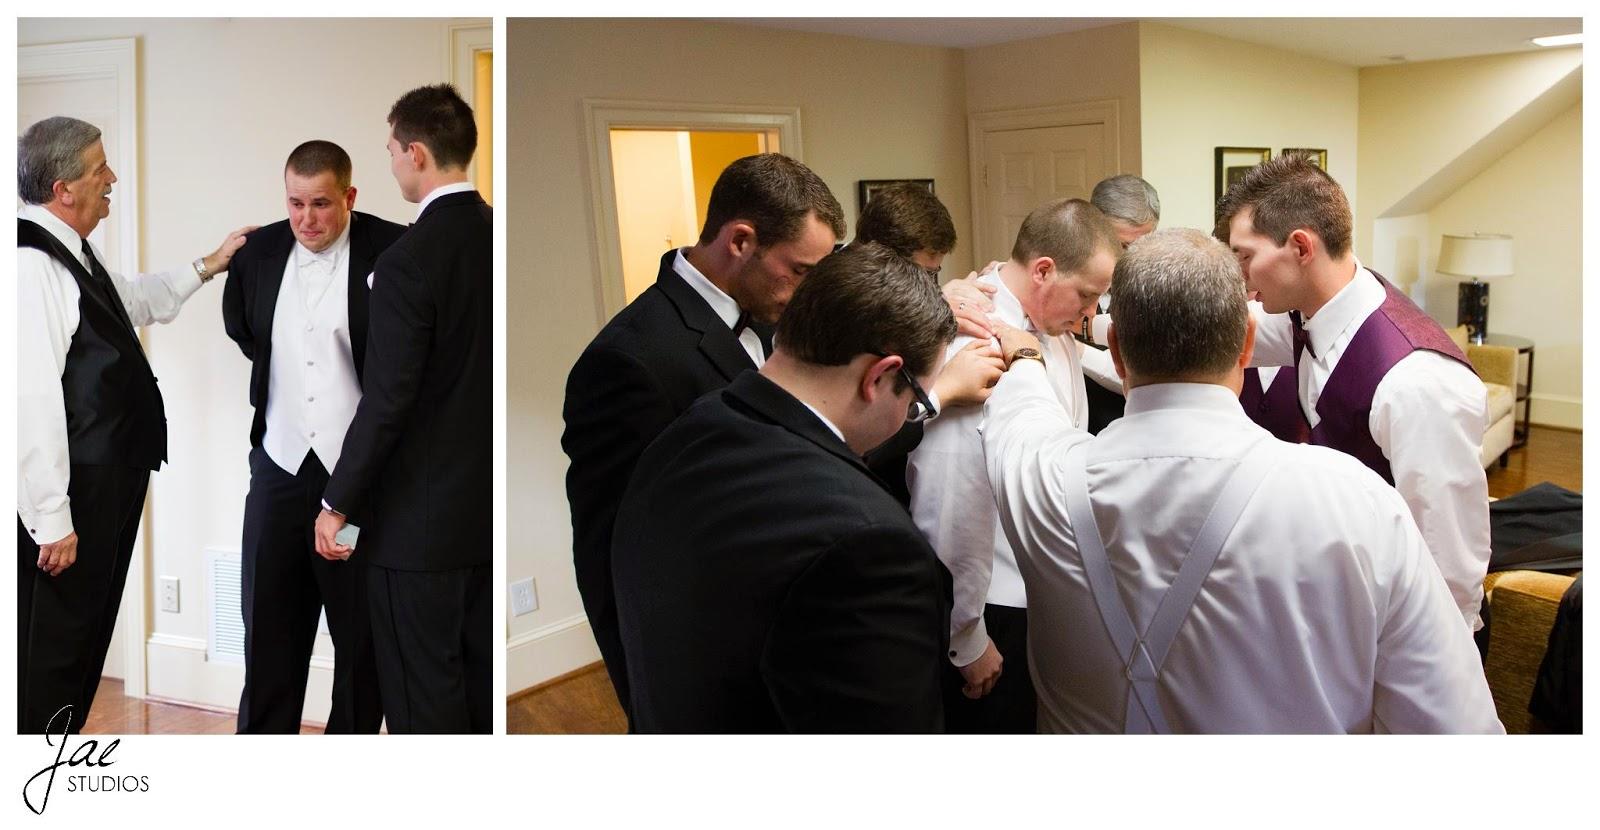 Jonathan and Julie, Bird cage, West Manor Estate, Wedding, Lynchburg, Virginia, Jae Studios, father, groomsmen, best man, crying, praying, tuxedo, purple, black